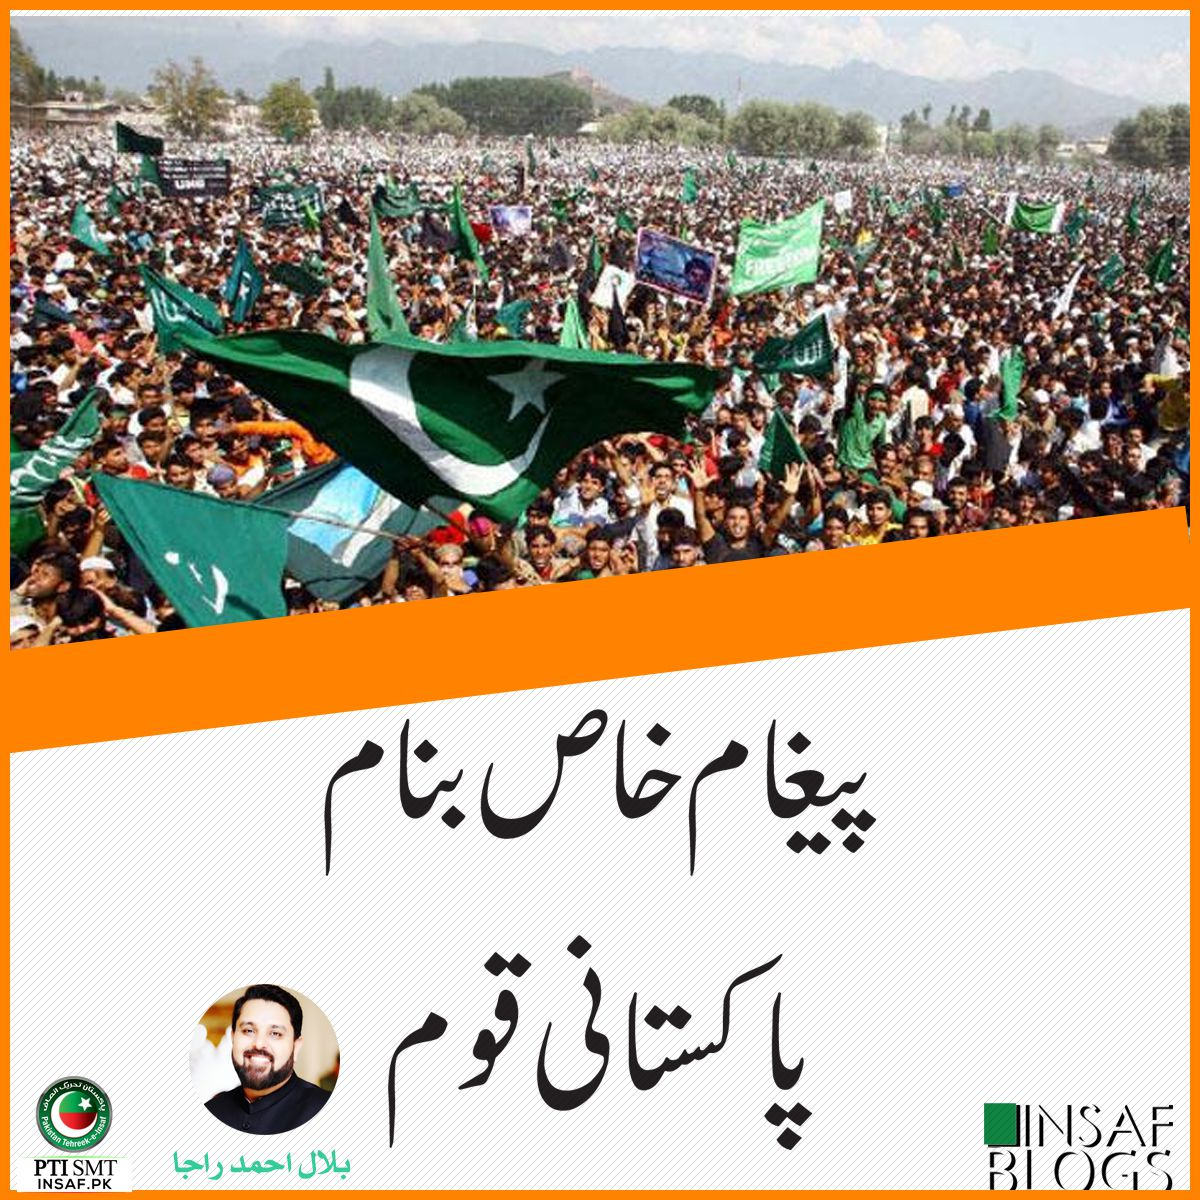 paigham-banaam-pakistan-insaf-blog